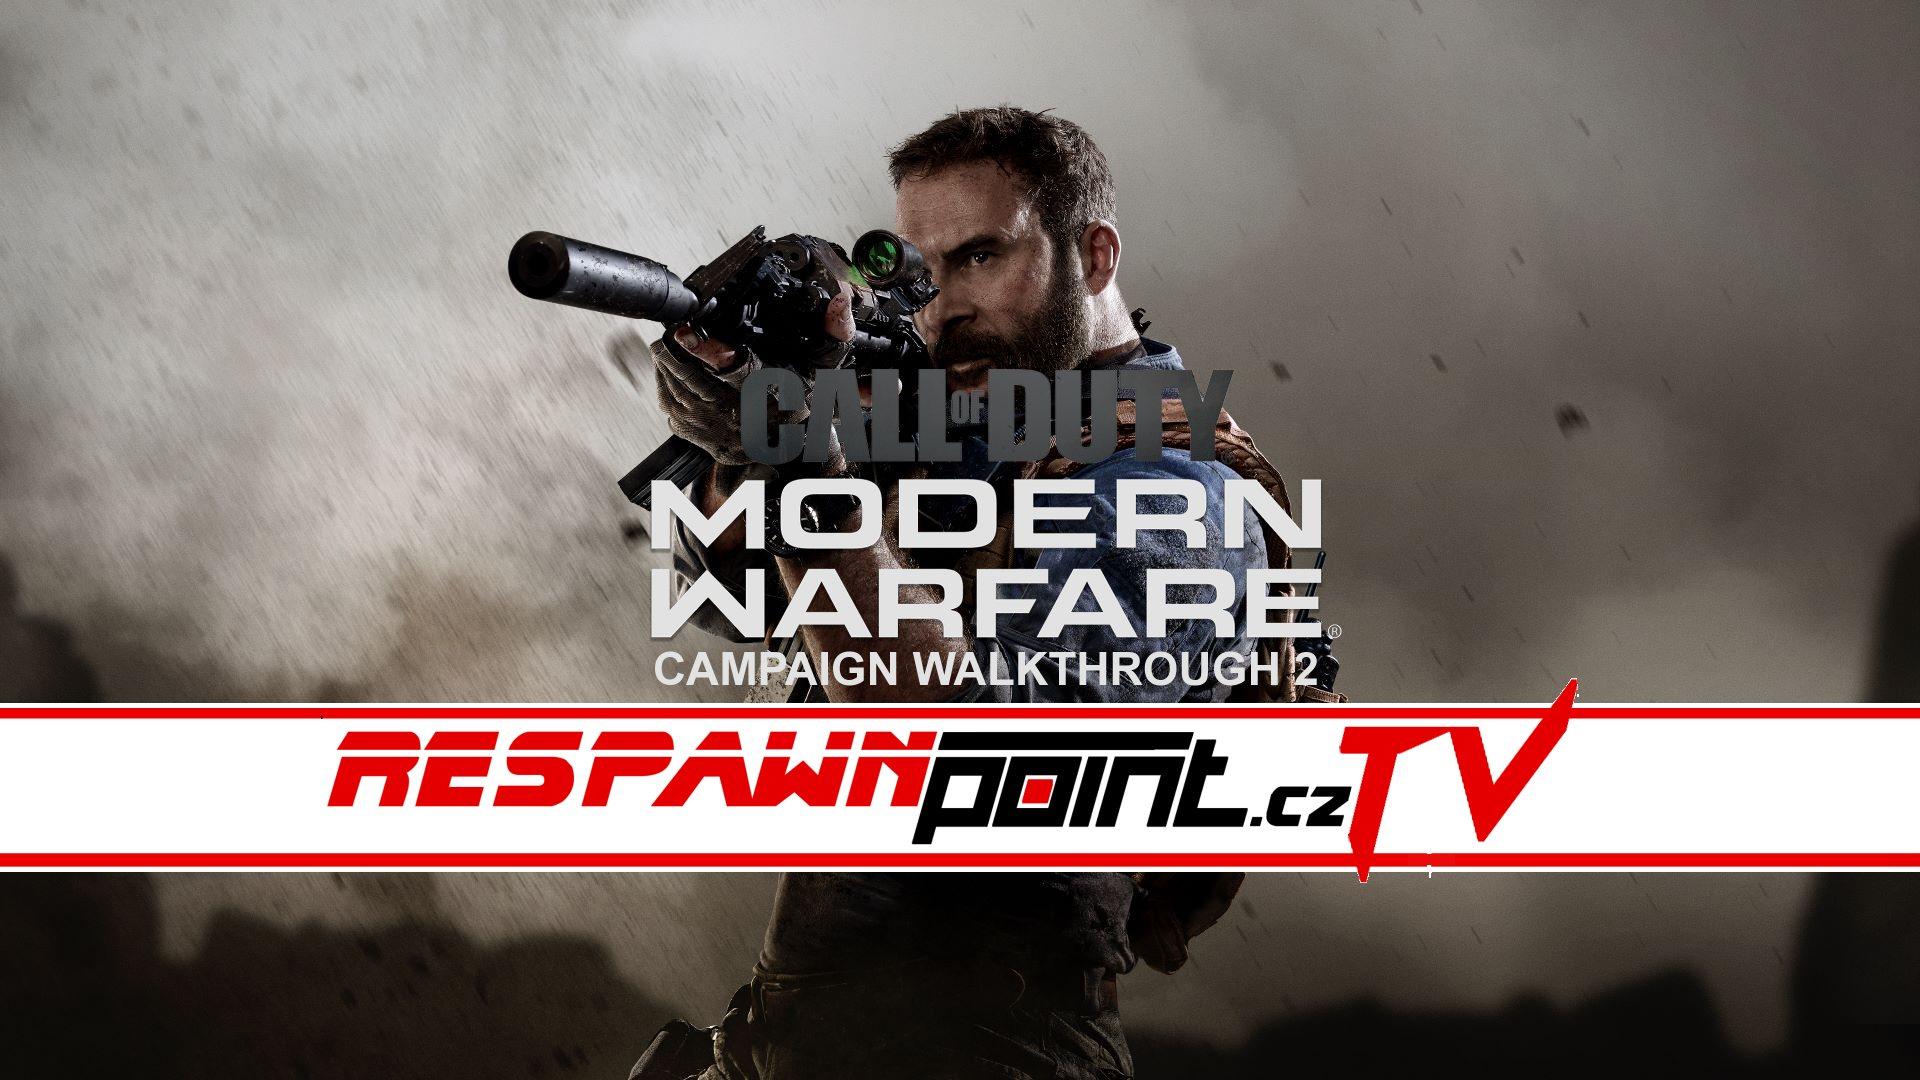 Call of Duty Modern Warfare – Campaign Walkthrough 2